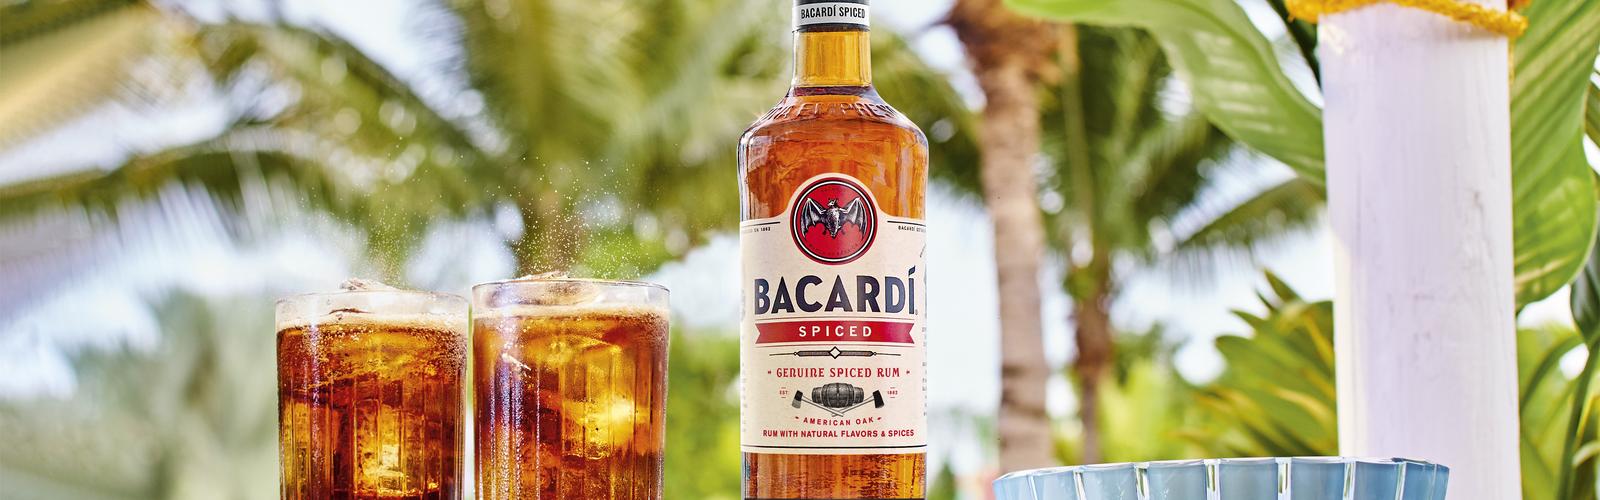 BACARDI Spiced 2